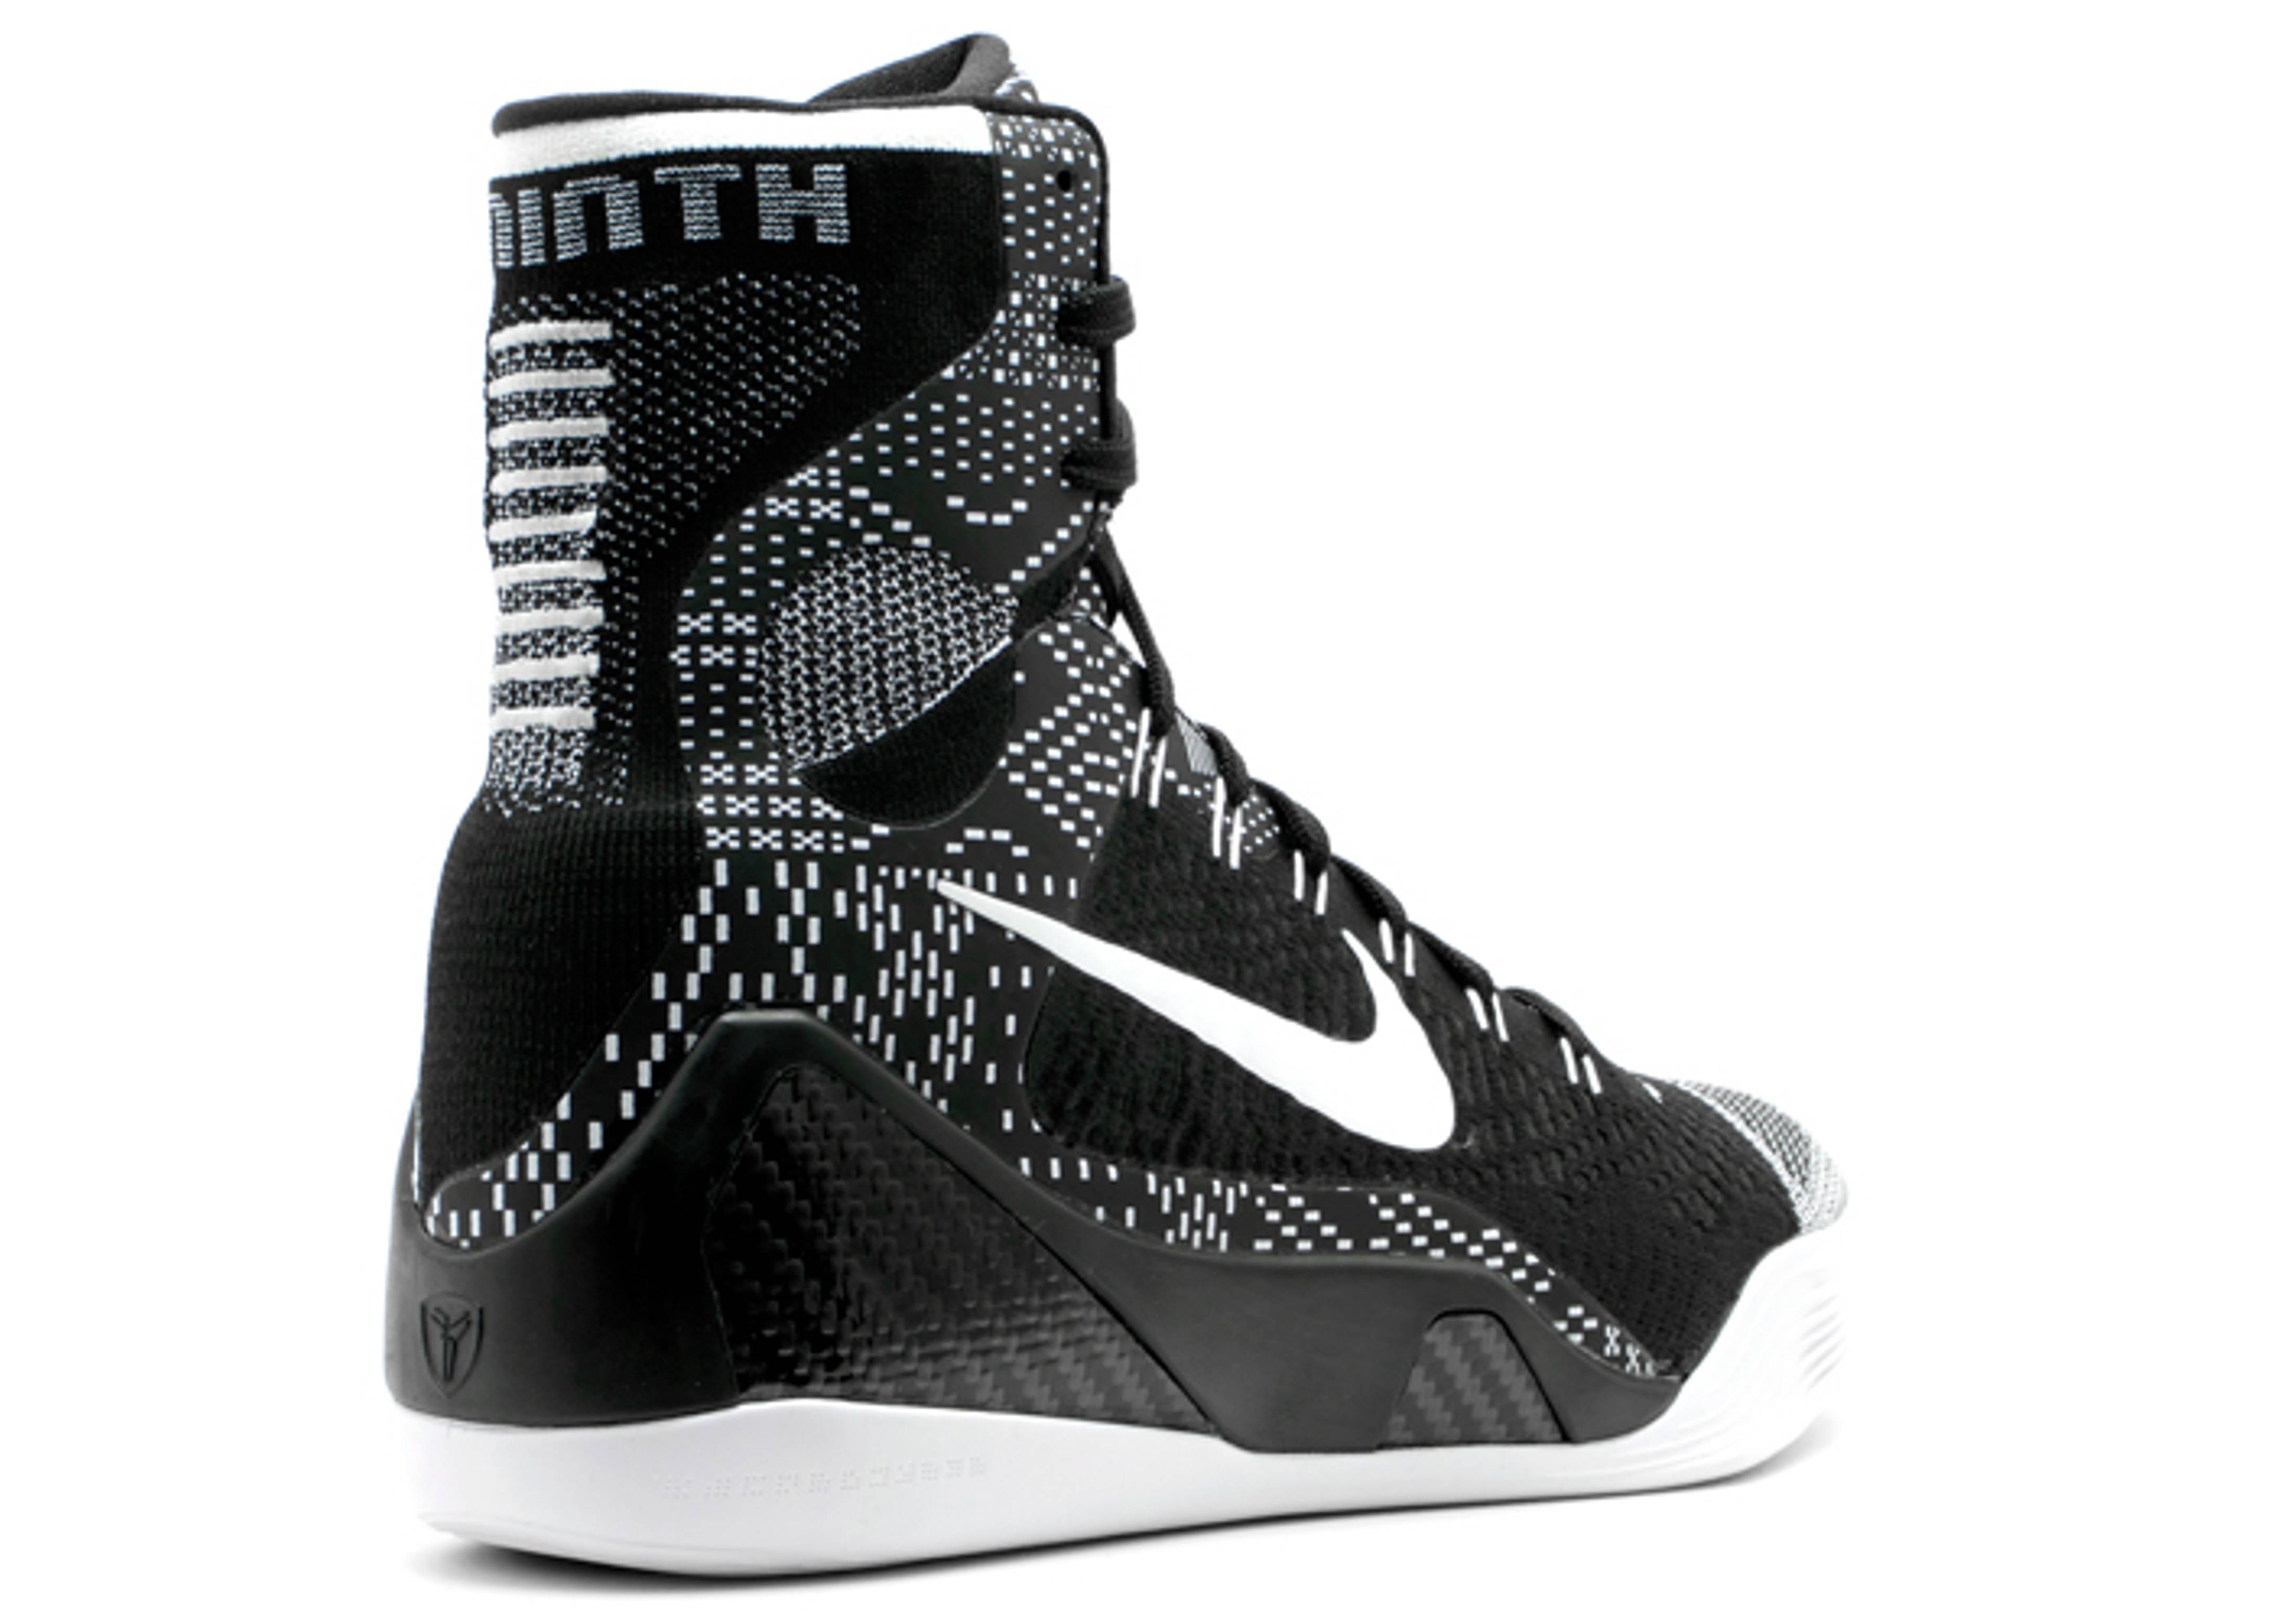 huge discount e1fc4 02b39 Kobe 9 Elite Bhm - Nike - 704304 010 - black white   Flight Club